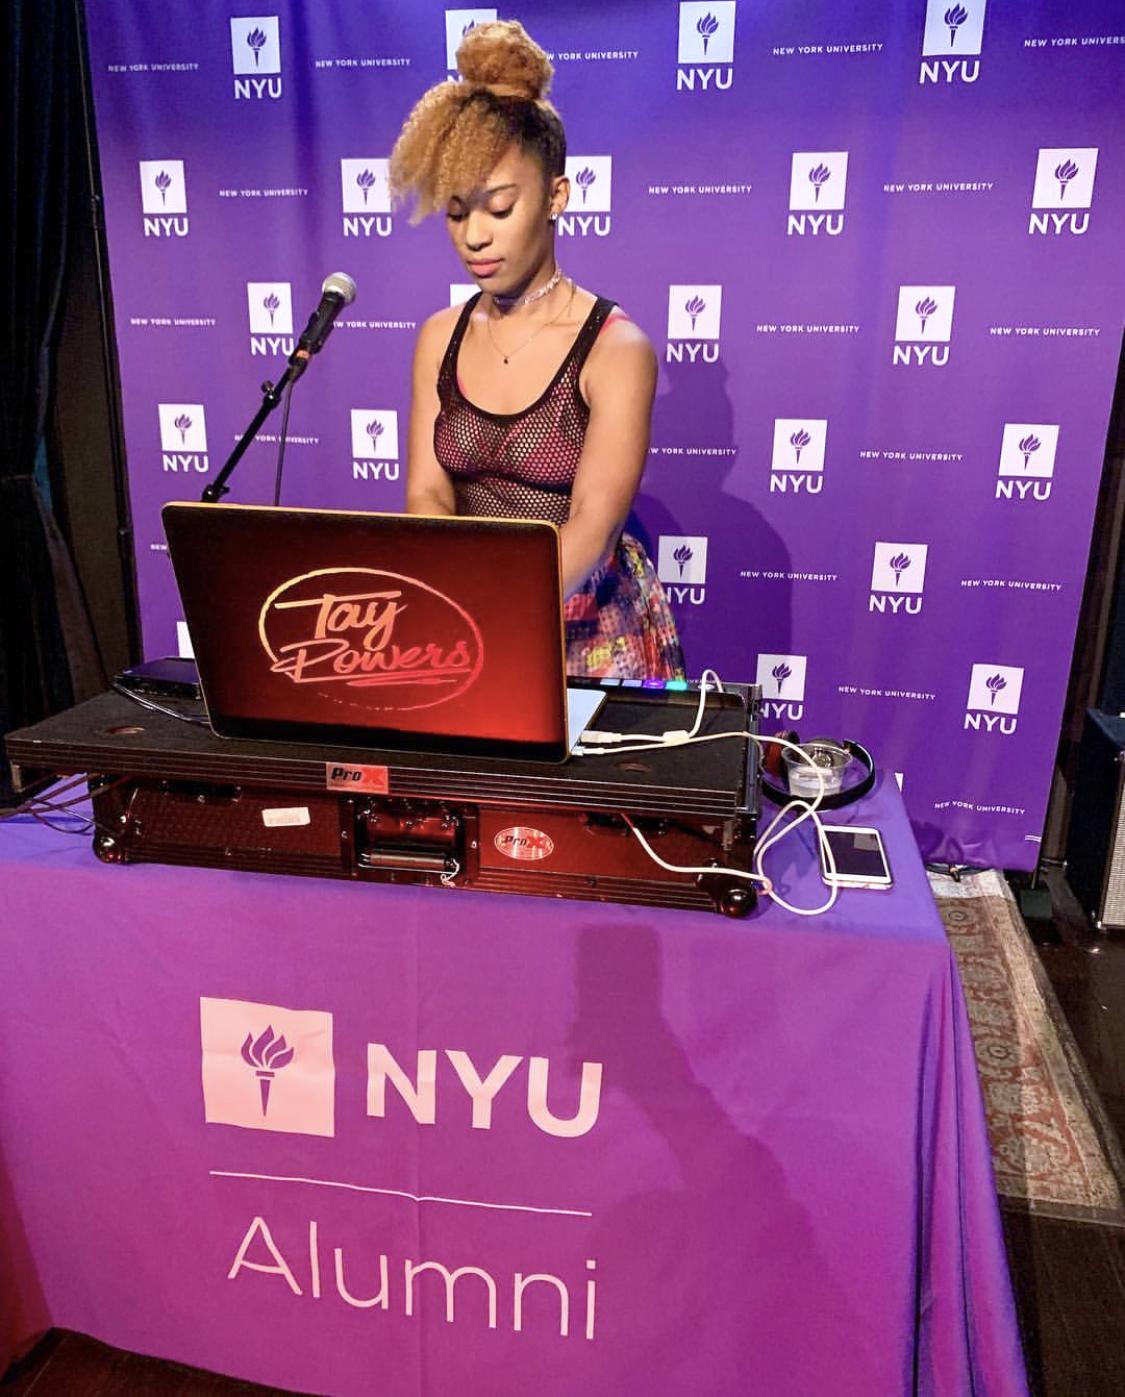 Unique Print NY - Large Format Printing - NYU Alumni SXSW Backdrop Banner, Table Throw.jpg